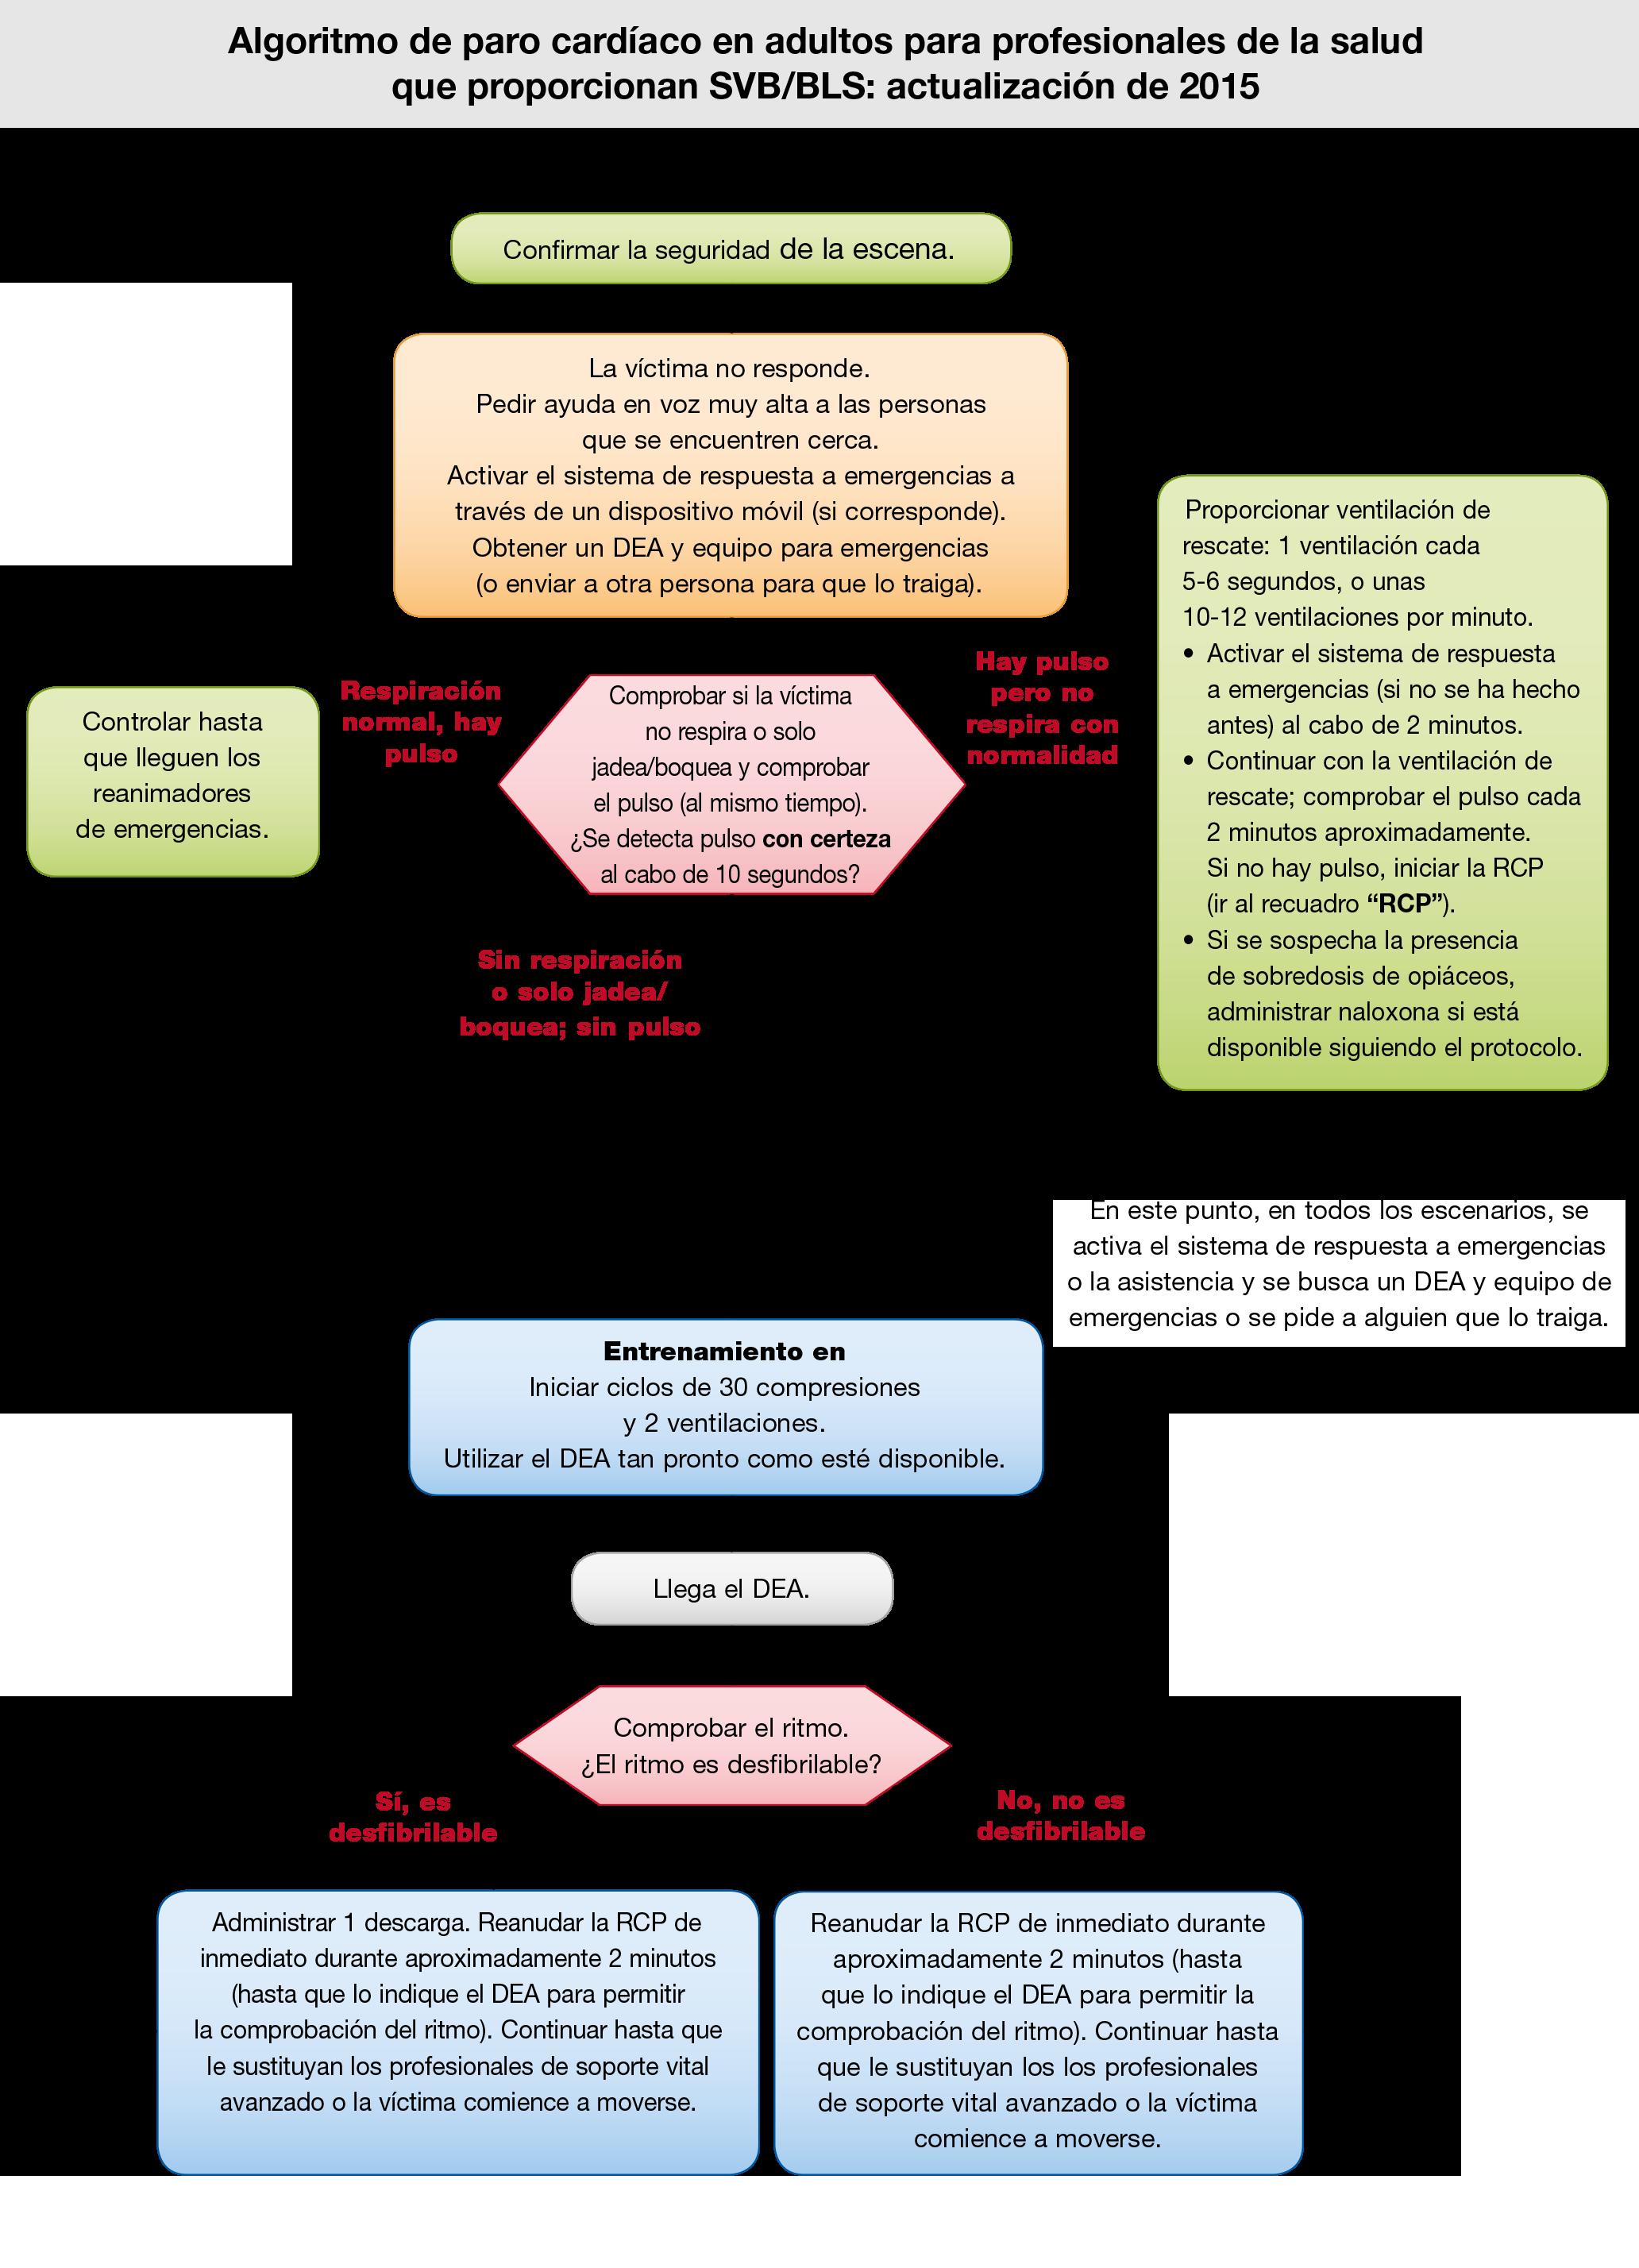 Algoritmo de SVB de la American Heart Association 2015